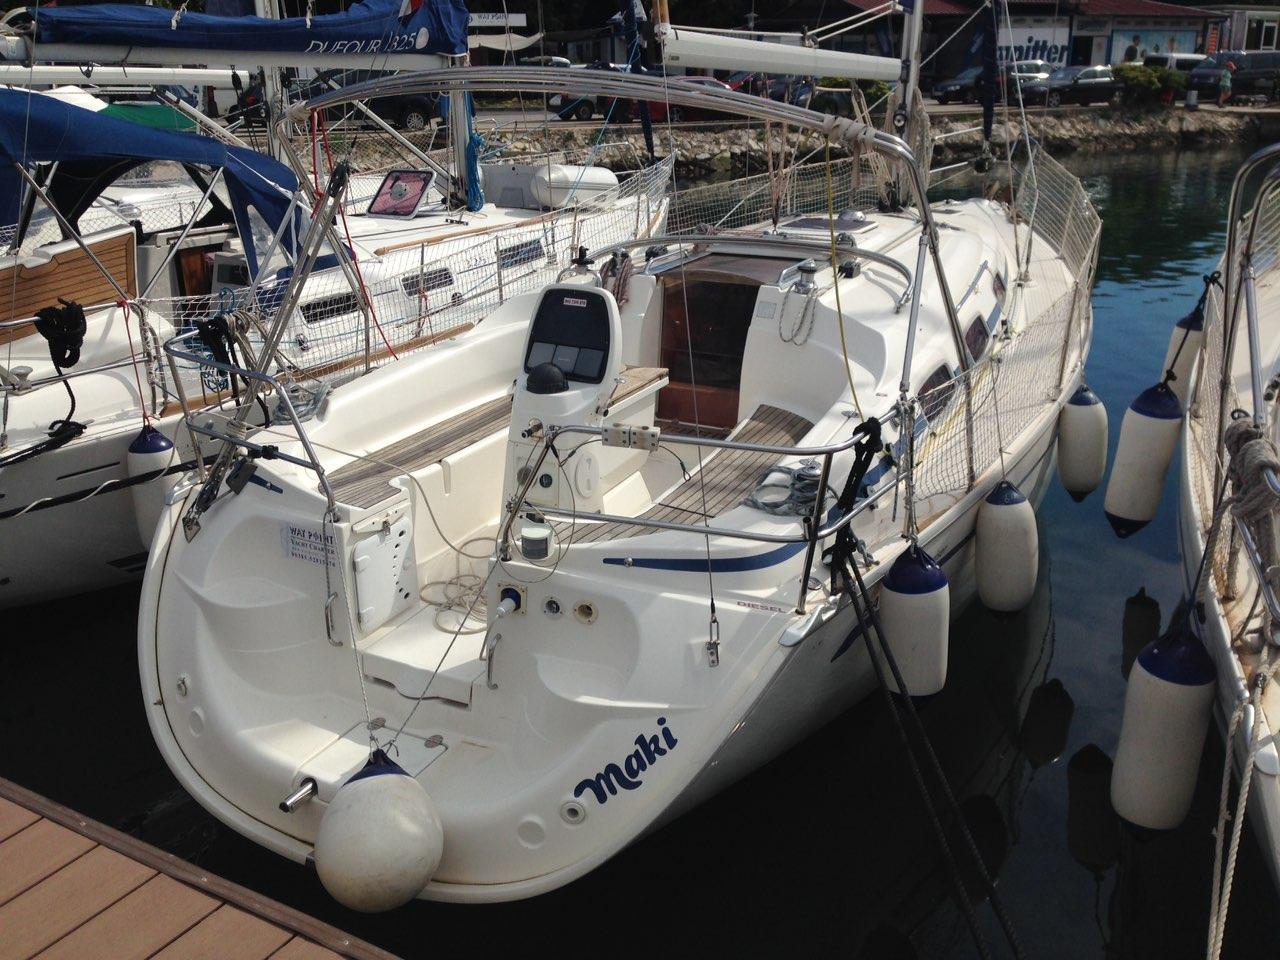 Bavaria 33 Cruiser, Maki